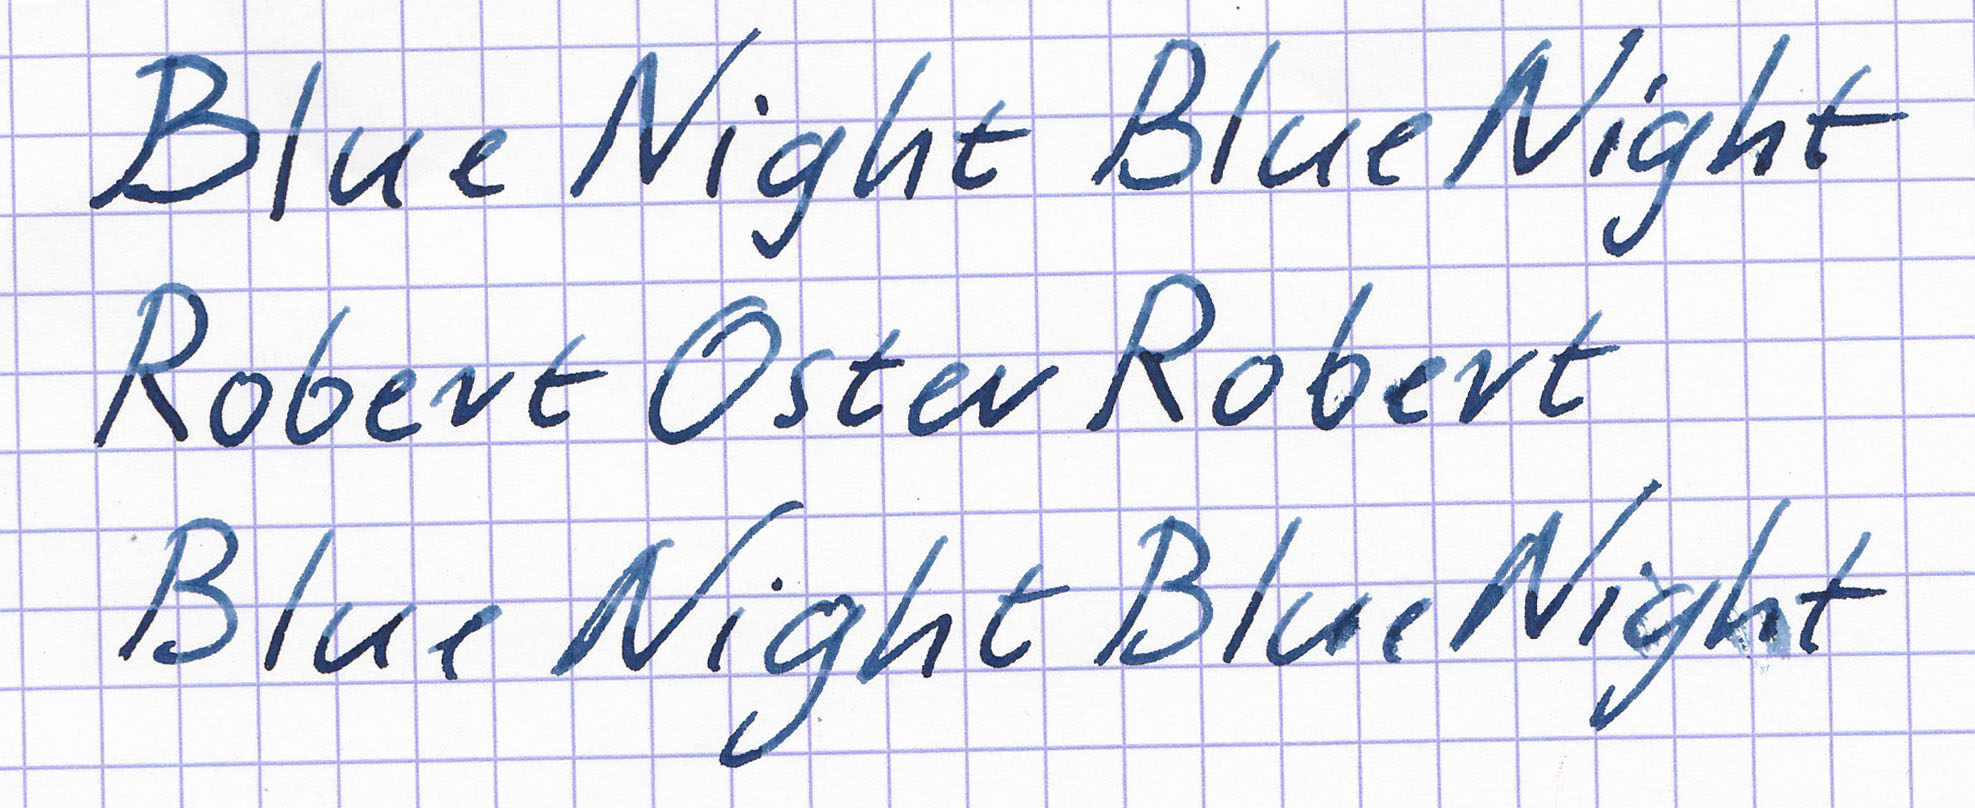 fpn_1465932728__bluenight_oster_ox_3.jpg